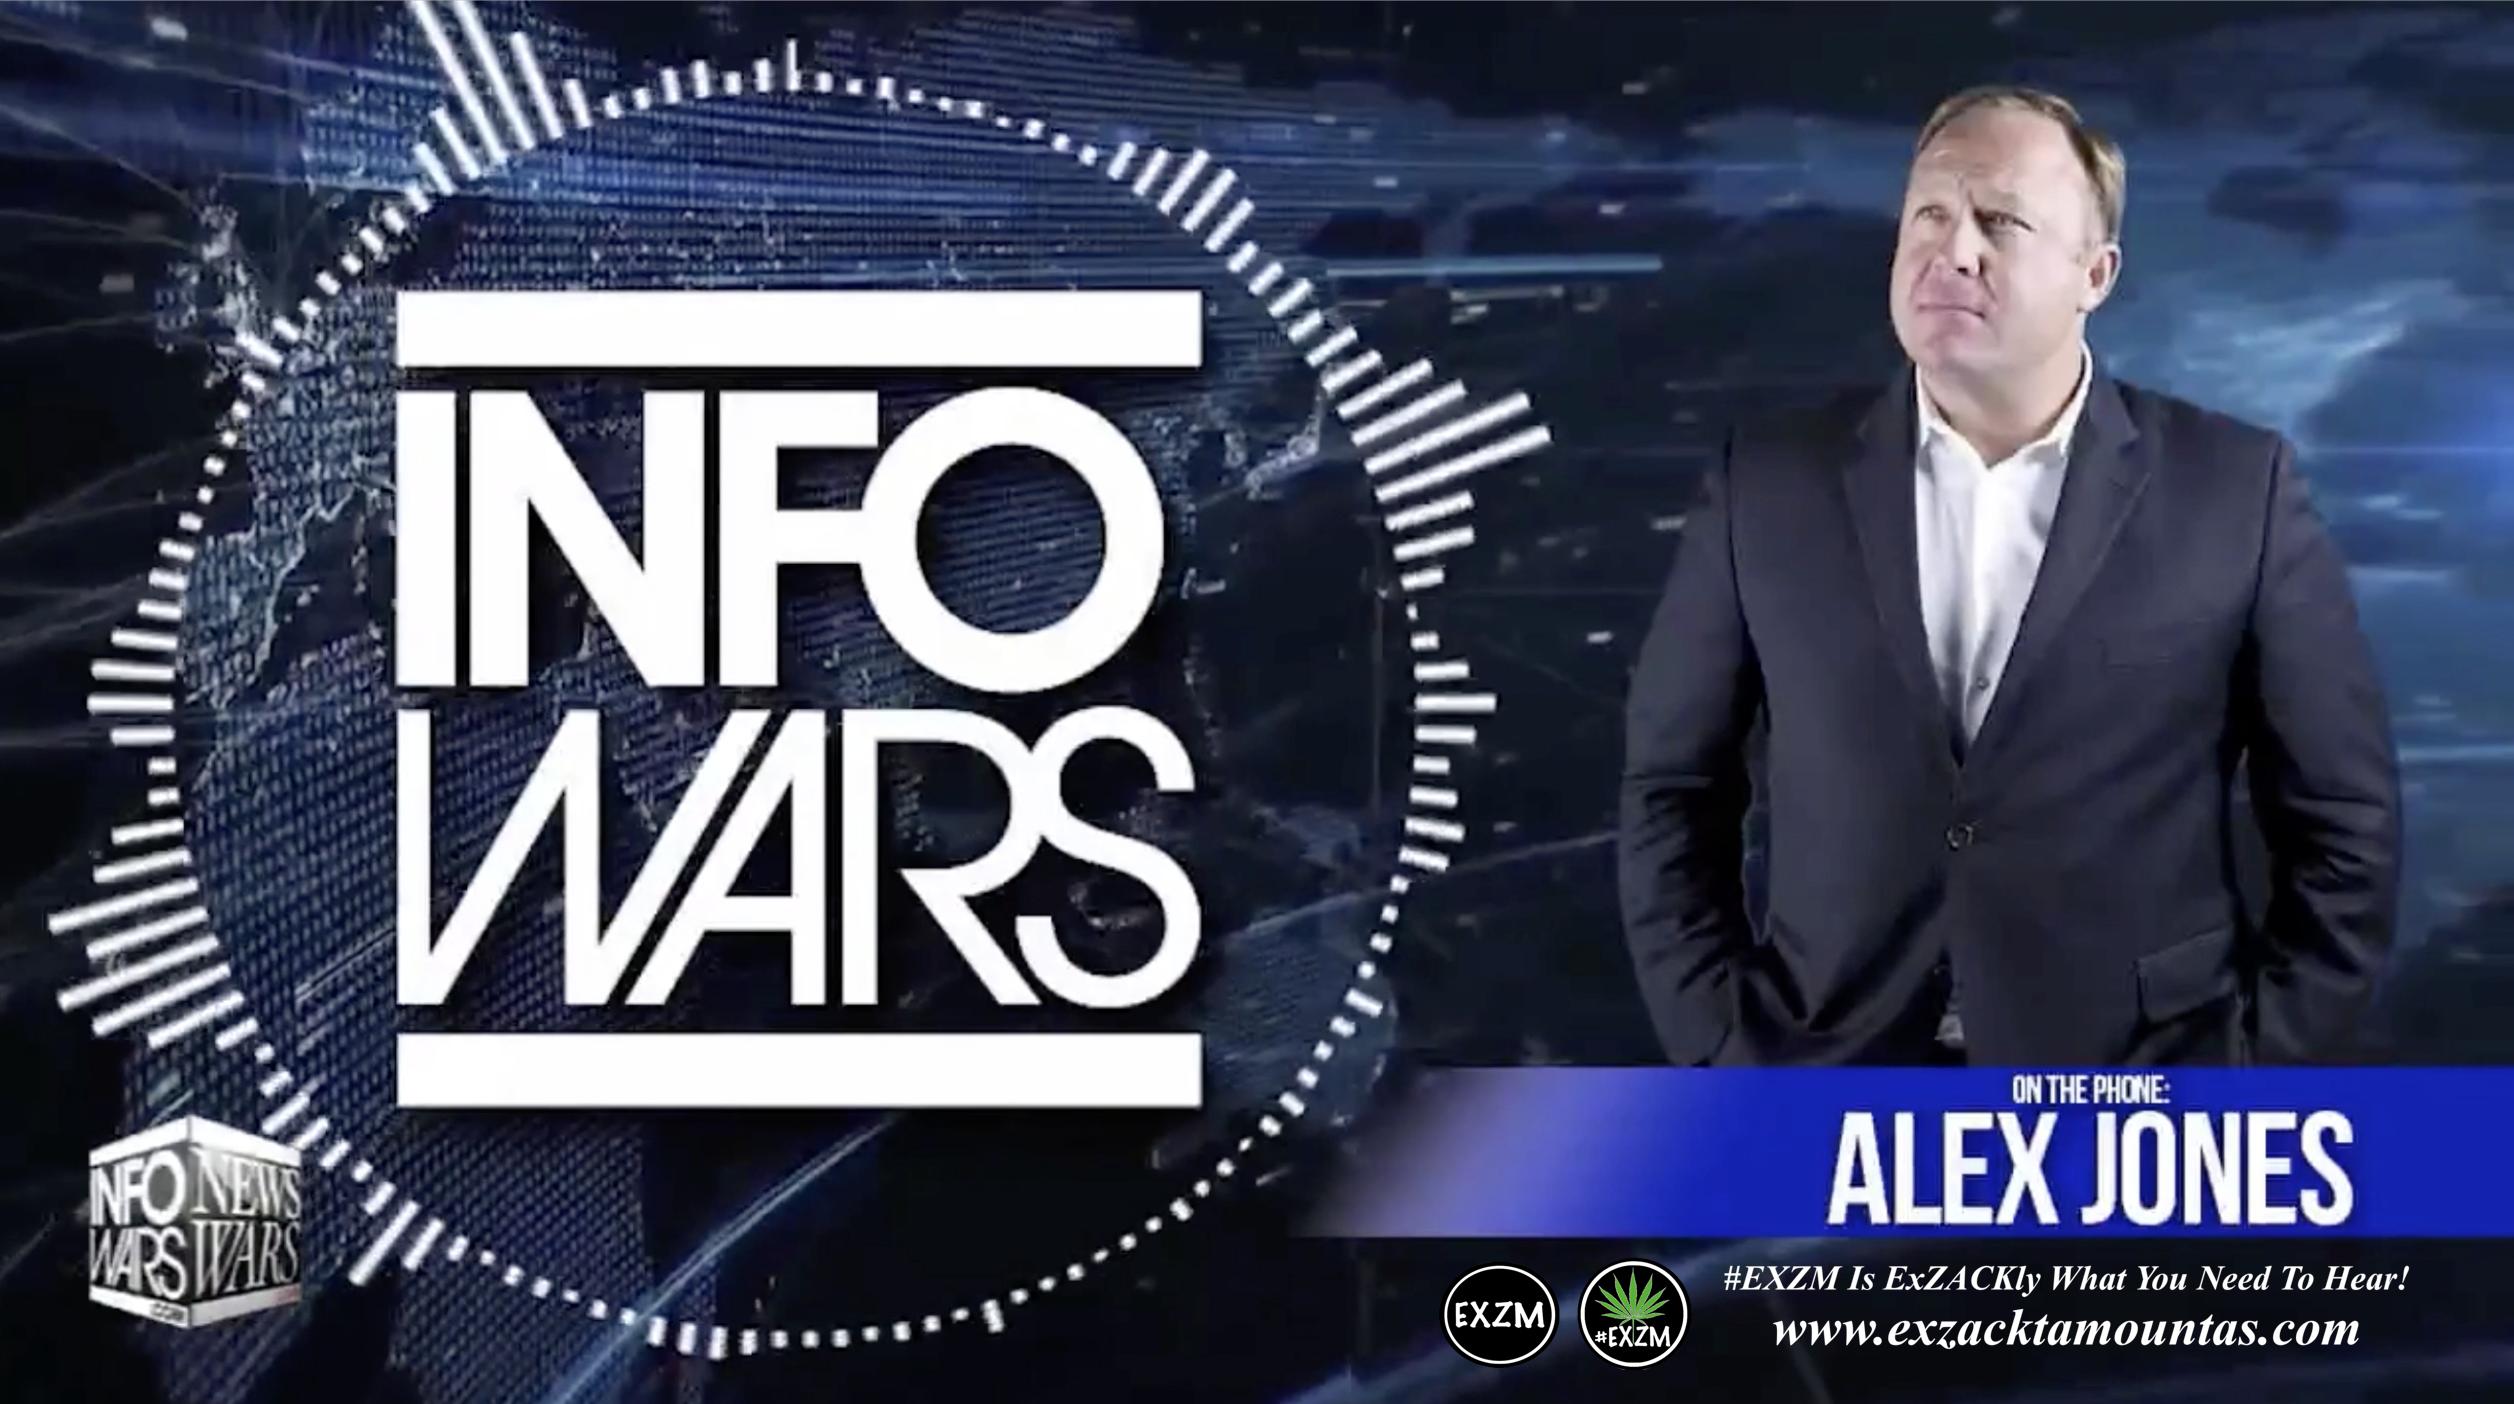 Alex Jones Live Infowars Studio EXZM Zack Mount March 28th 2021 copy